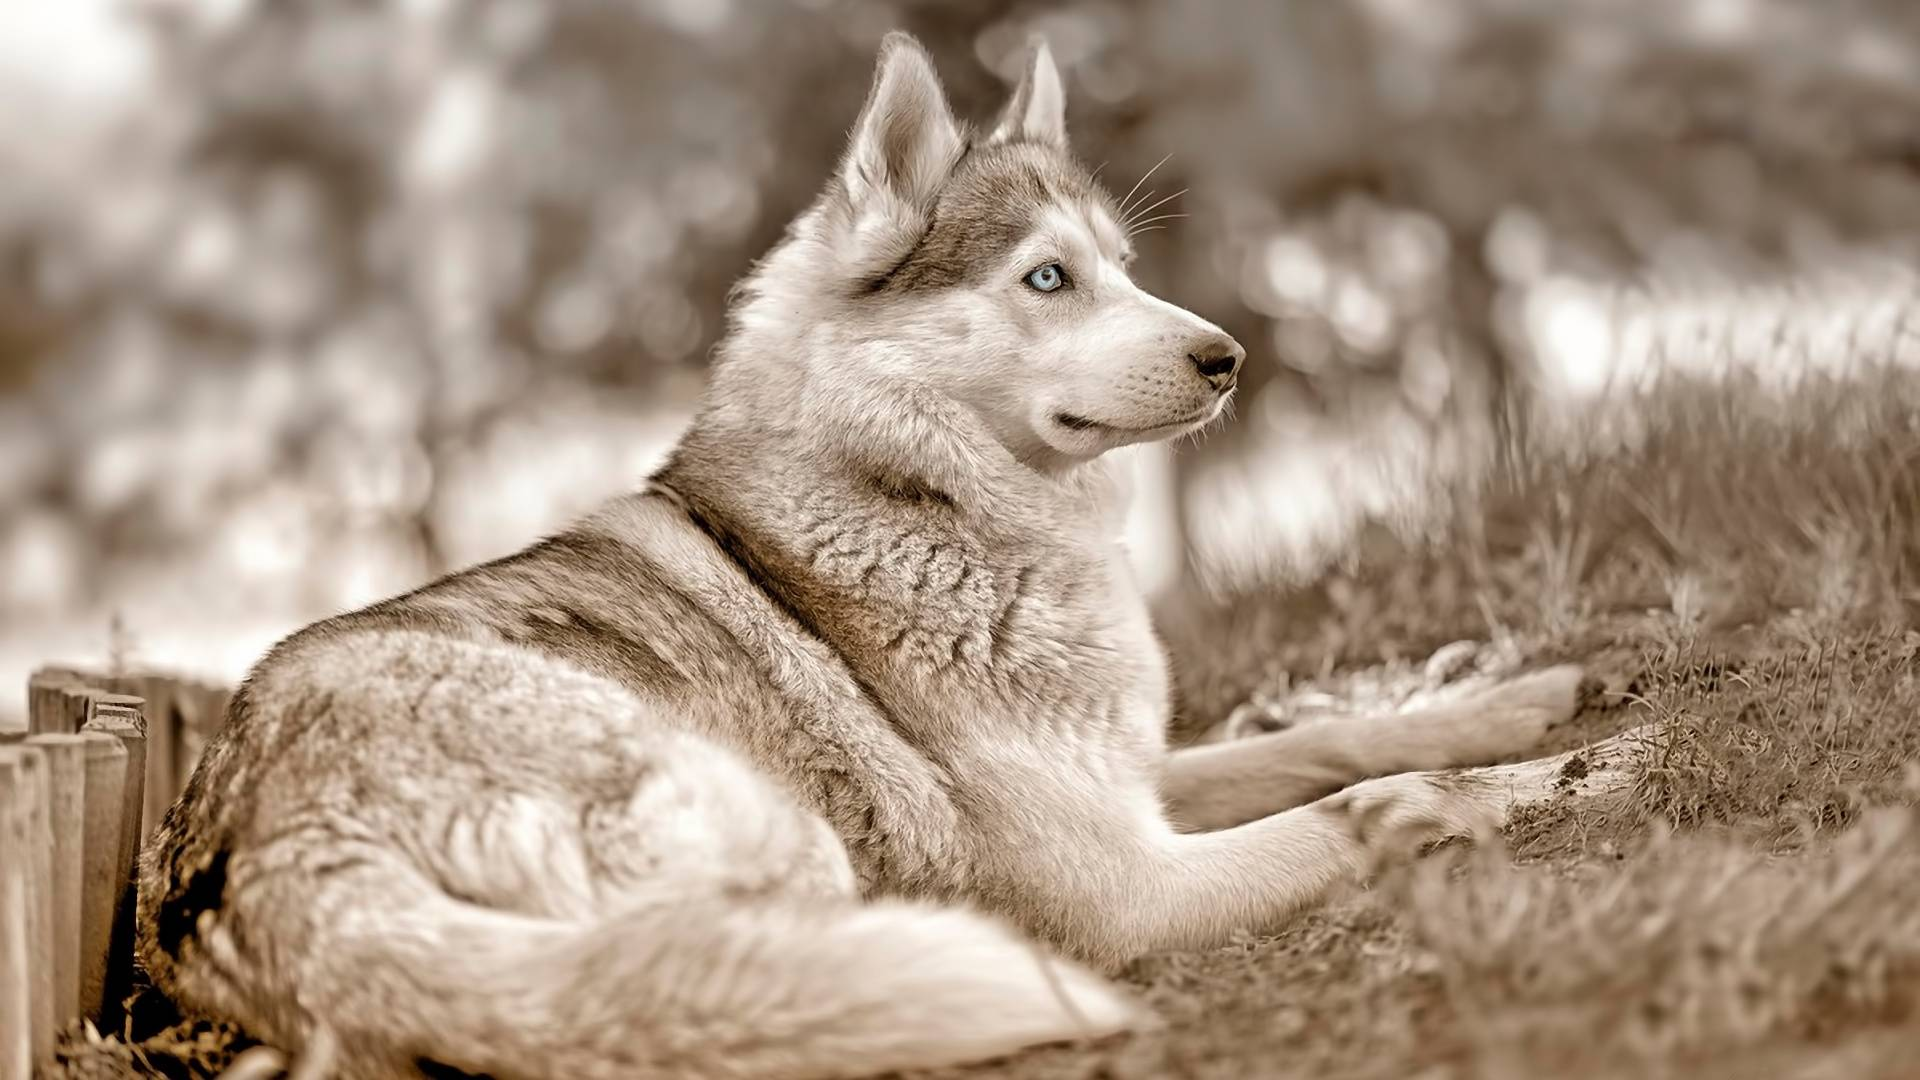 обои пес, хаски, морда, глаза голубые картинки фото